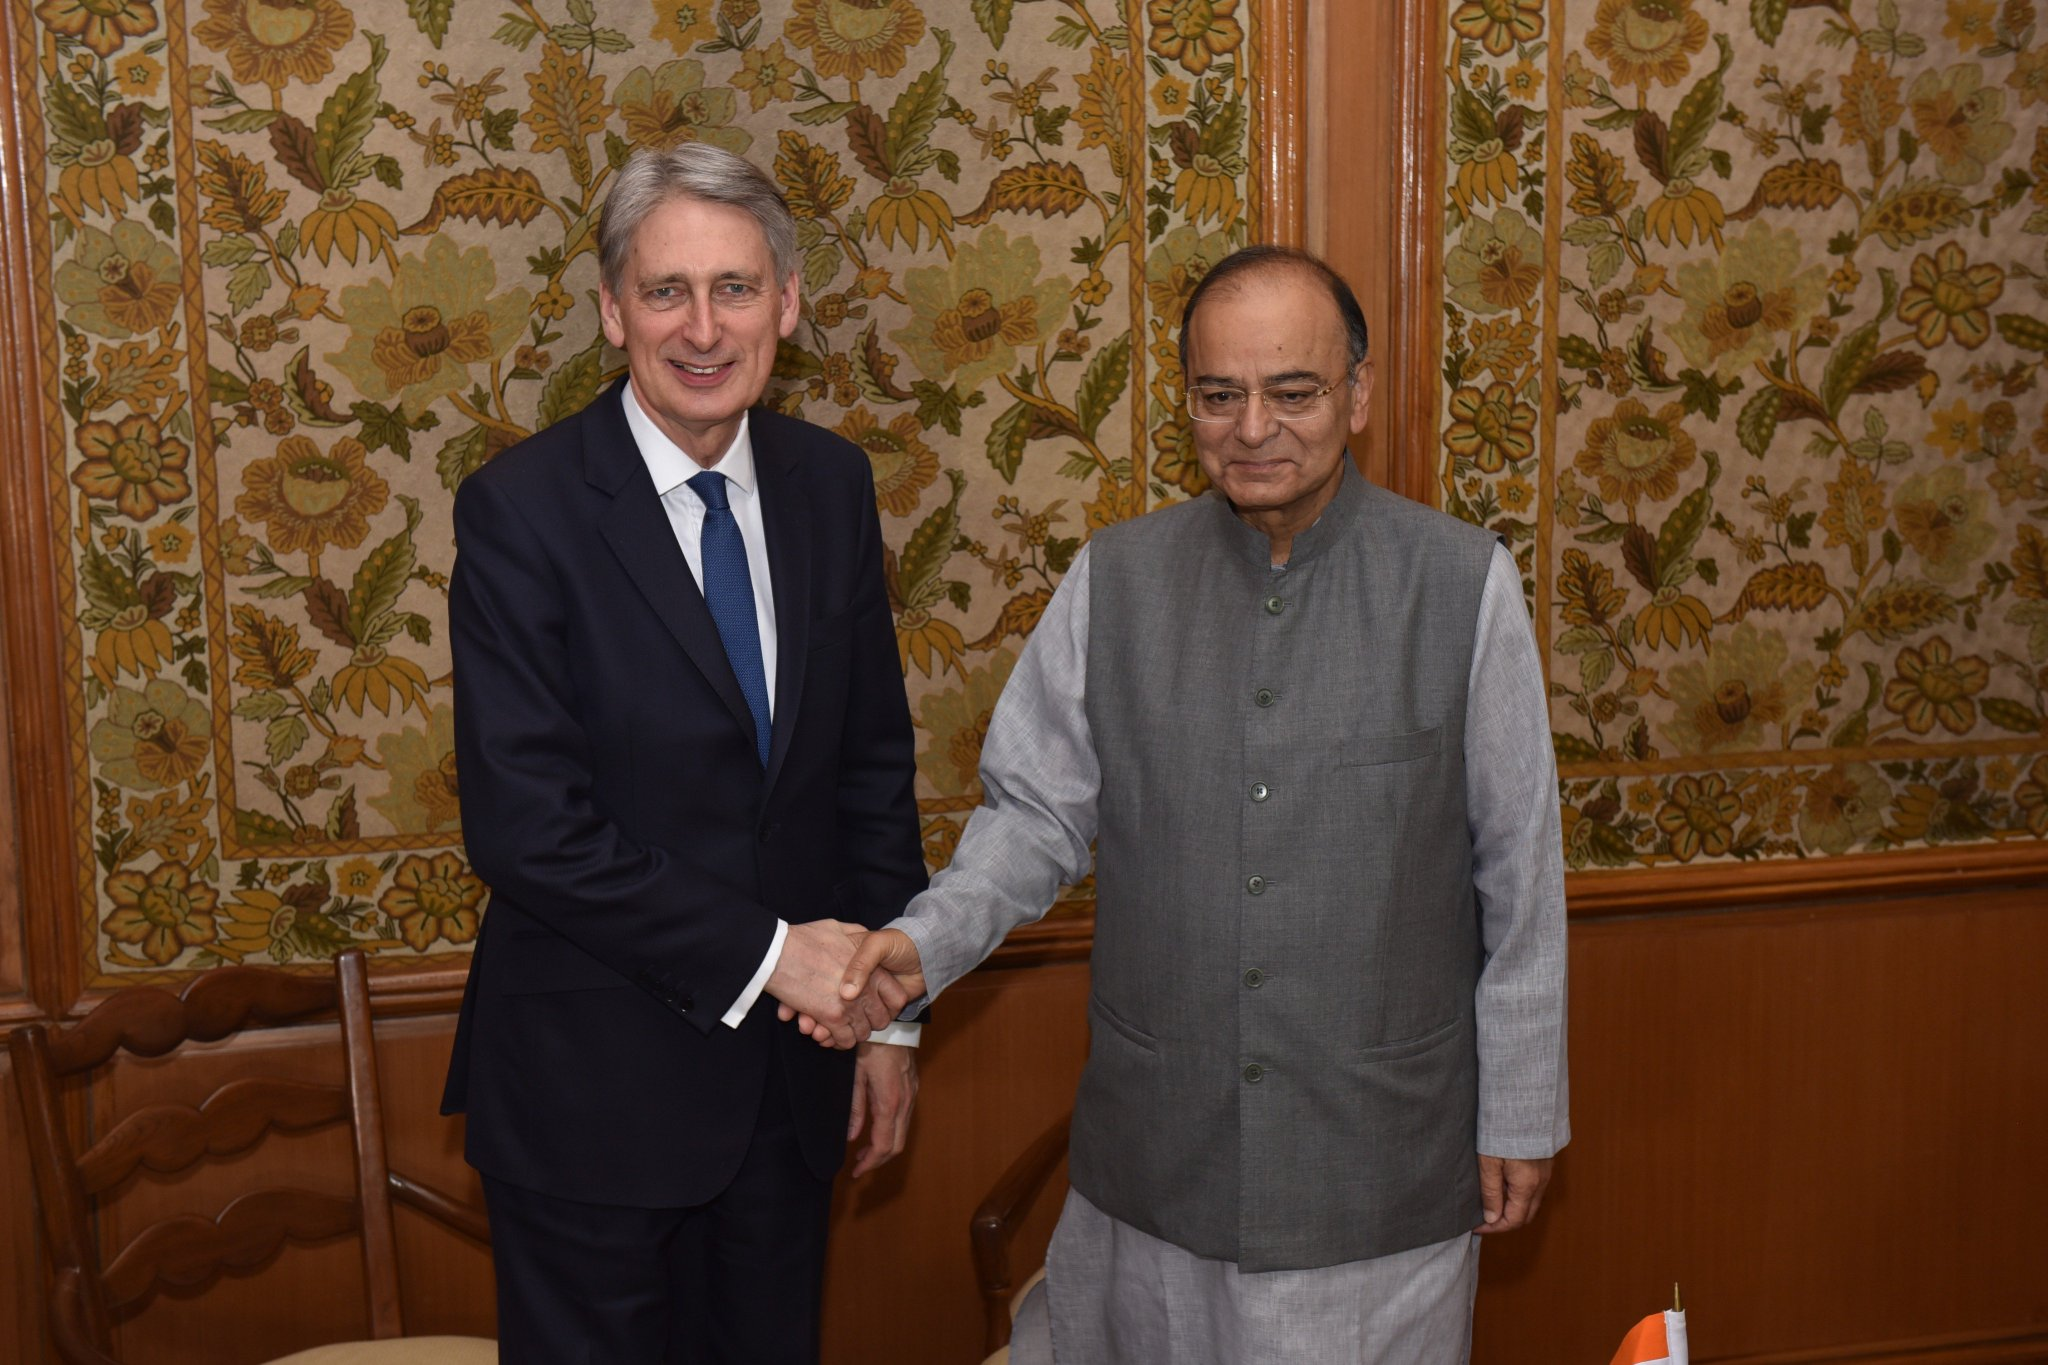 Thumbnail for Philip Hammond, Mark Garnier and Baroness Neville-Rolfe visit India